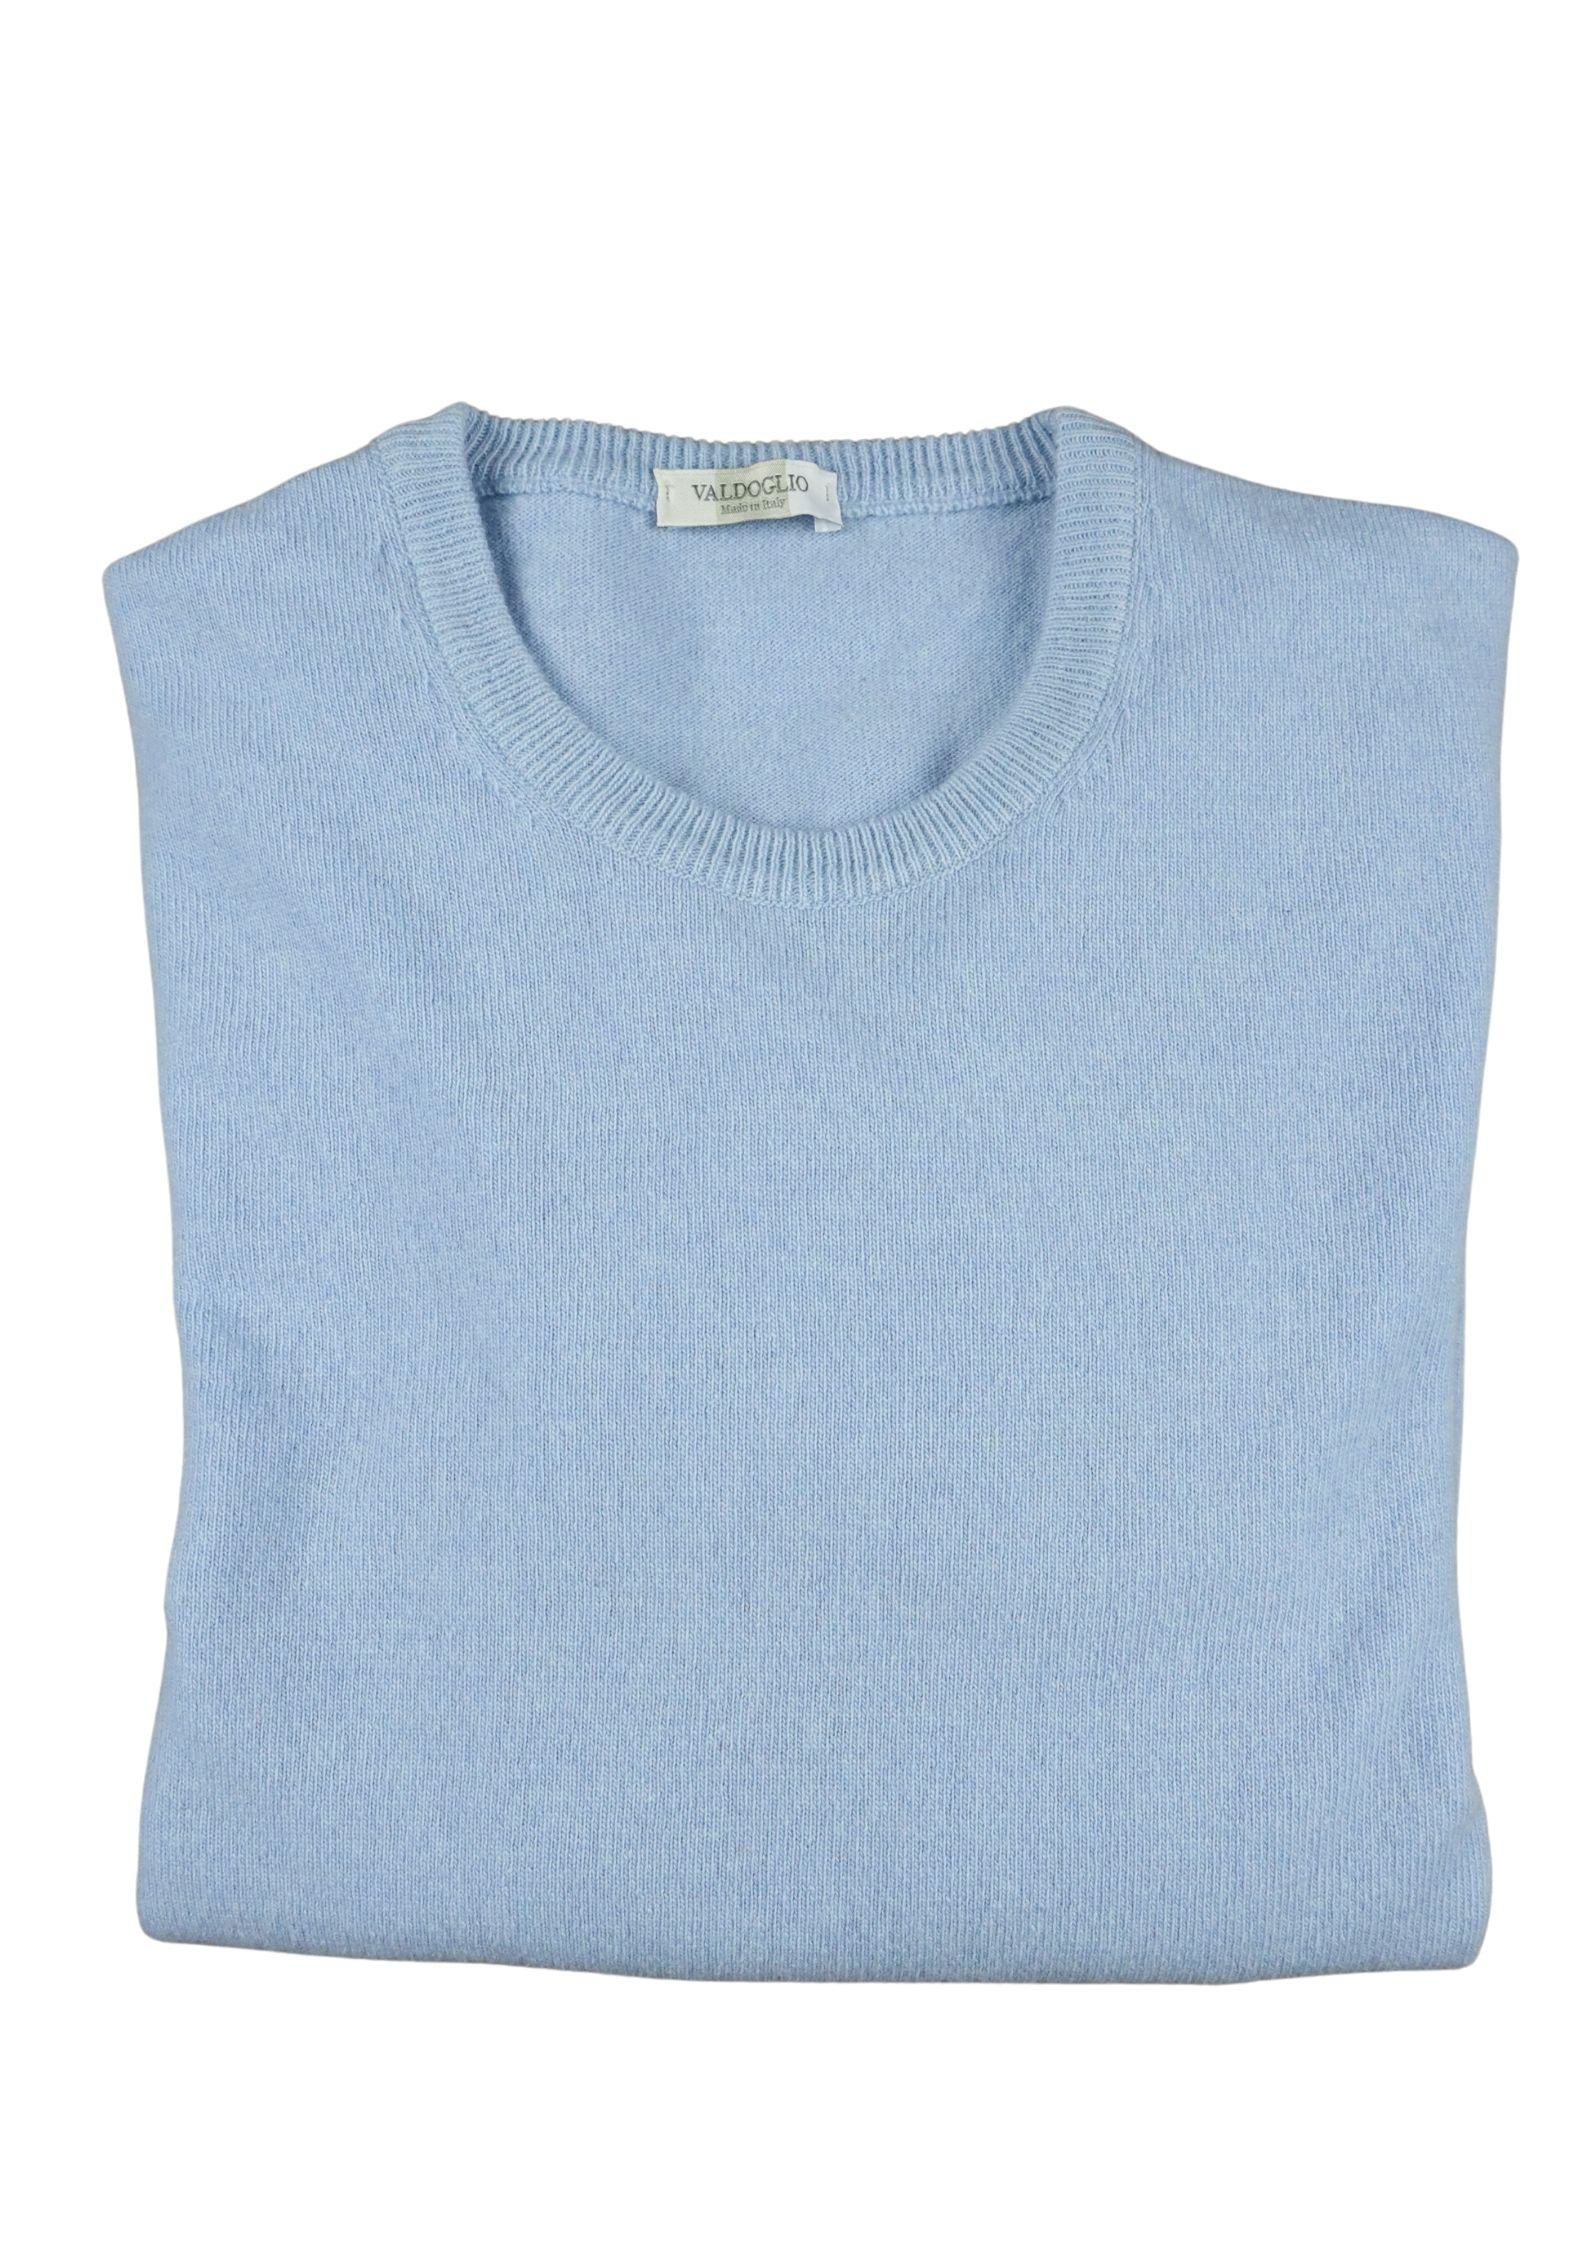 VALDOGLIO   Knitwear   317D286